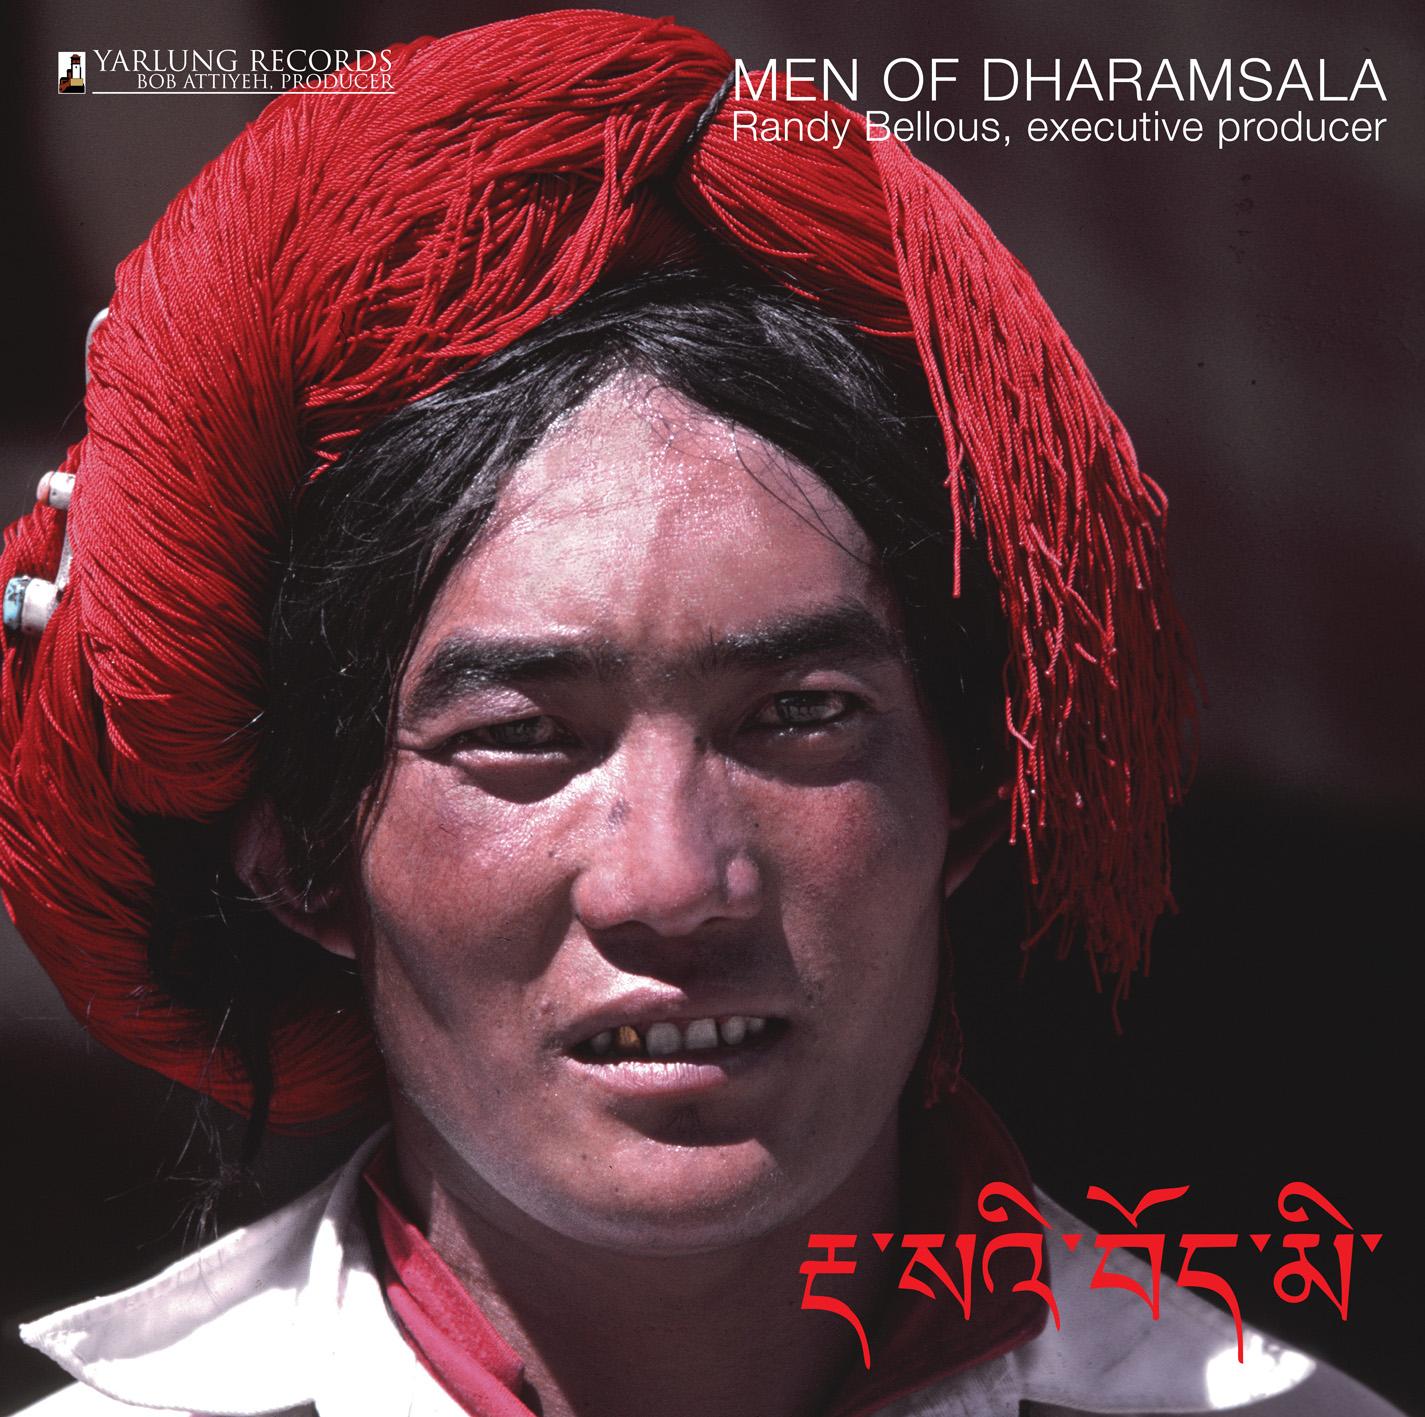 Men of Dharamsala